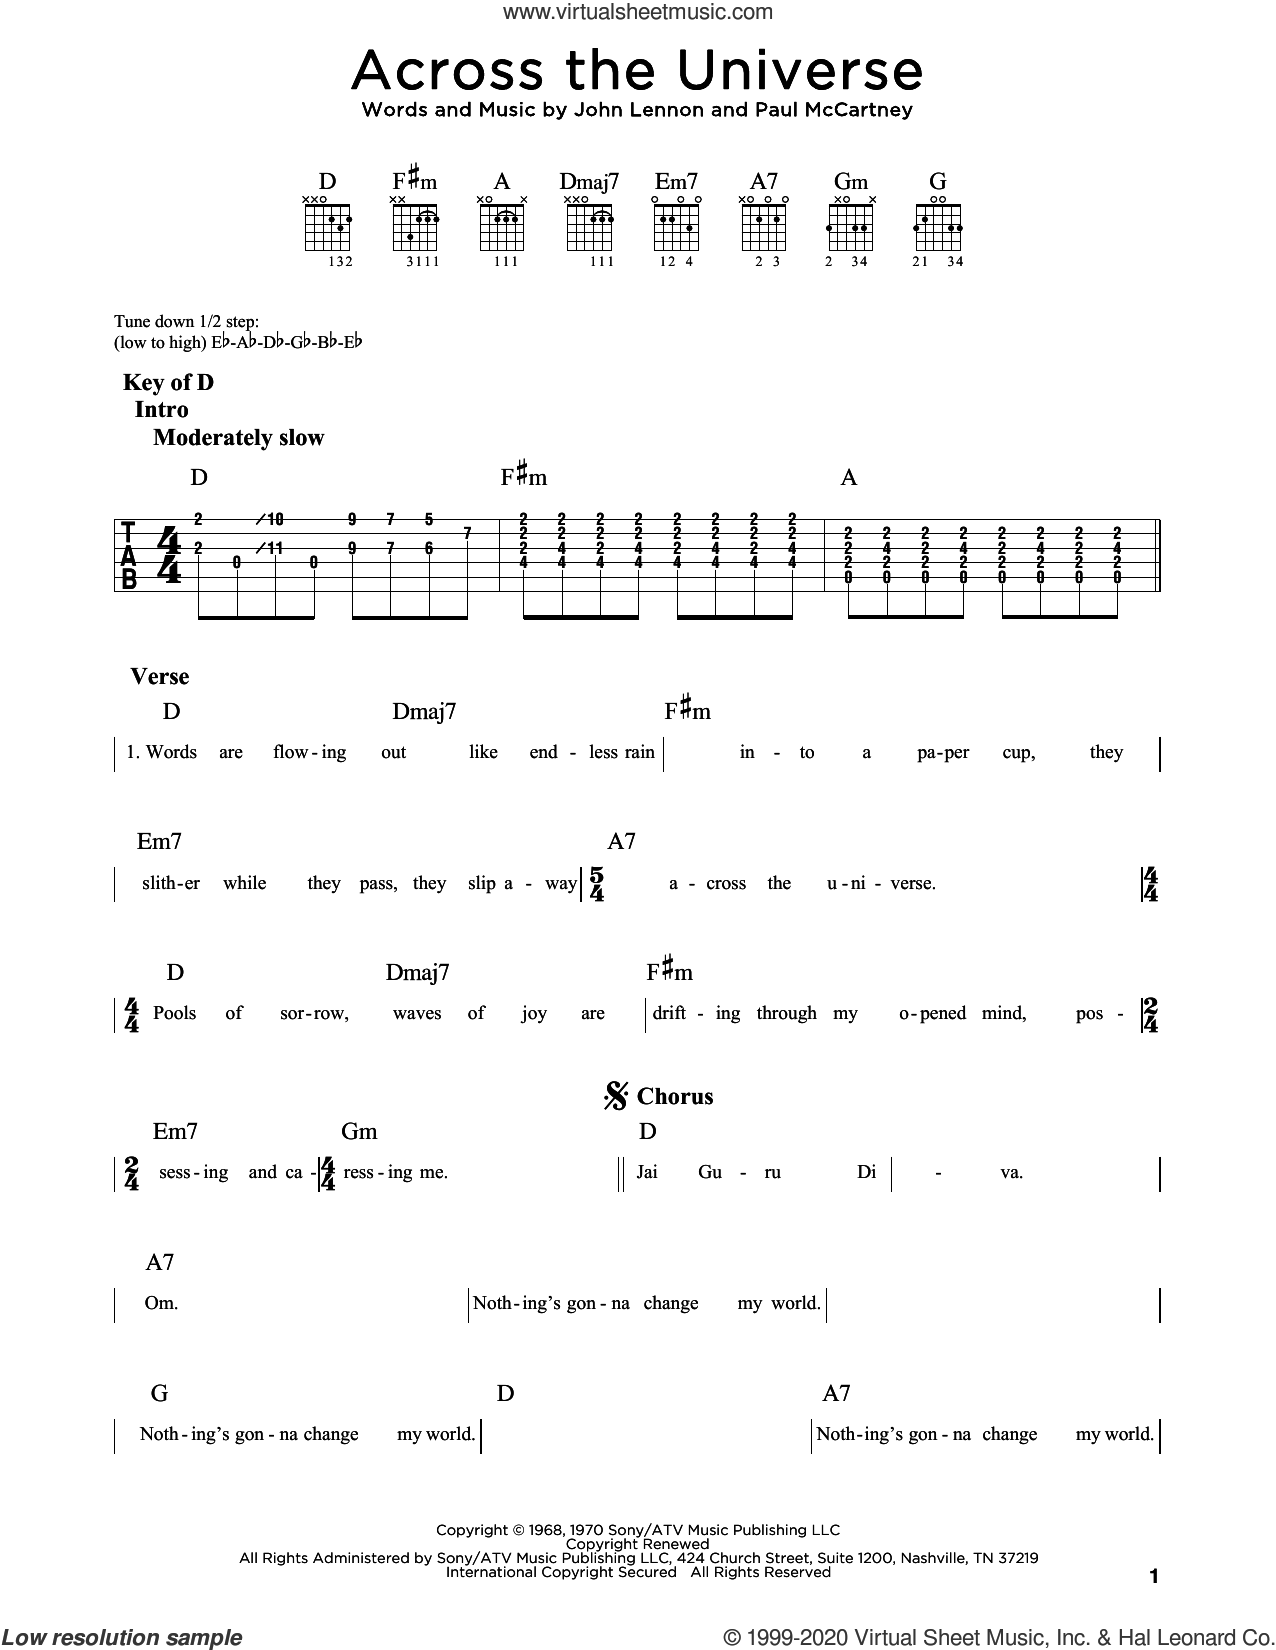 Across The Universe sheet music for guitar (rhythm tablature) by The Beatles, John Lennon and Paul McCartney, intermediate skill level